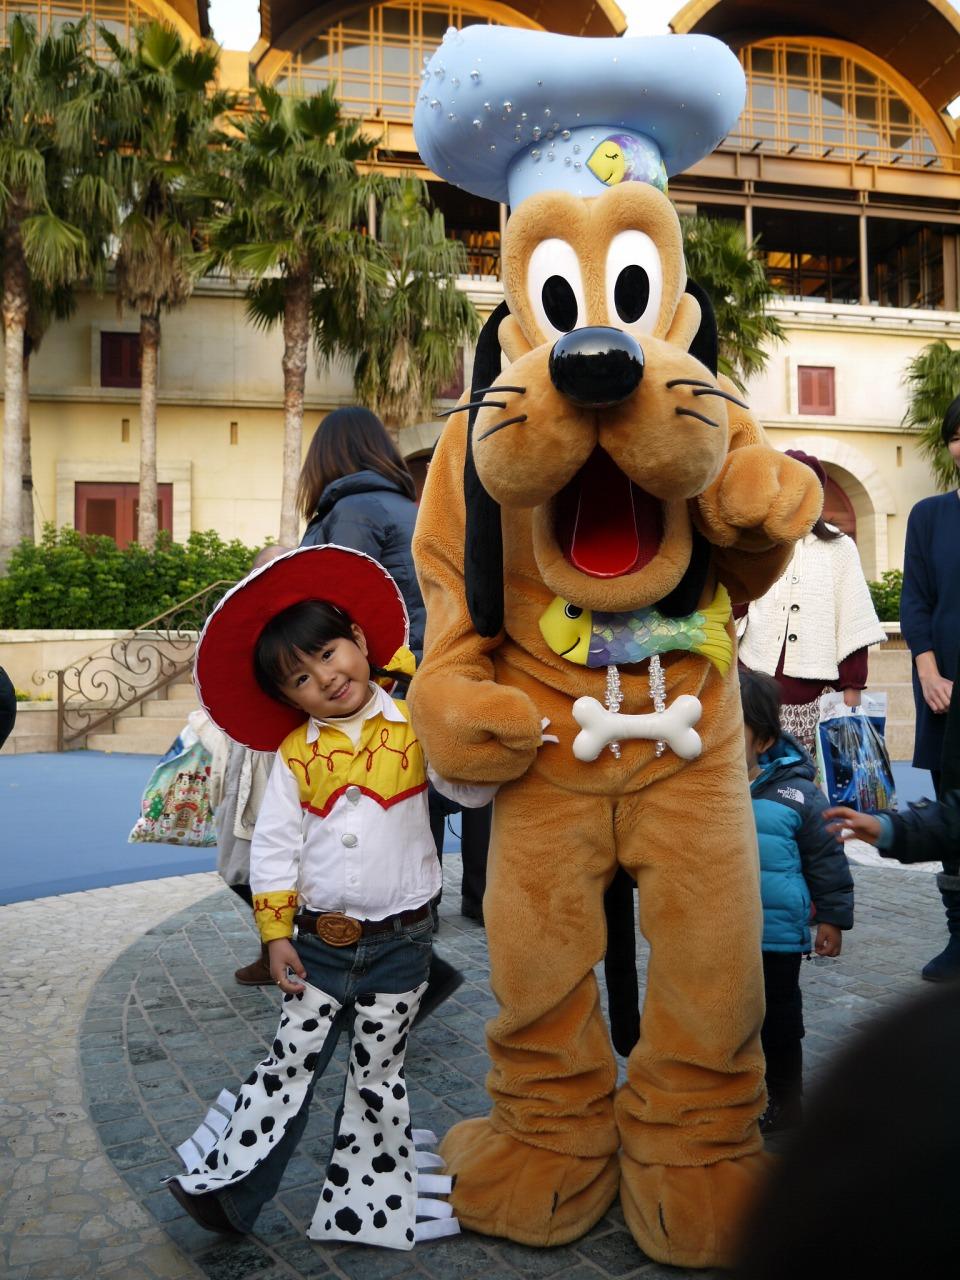 12 toy story toystory jessie woody costume cosplay disney disneyland disneysea トイストーリー コスプレ 仮装 ジェシー